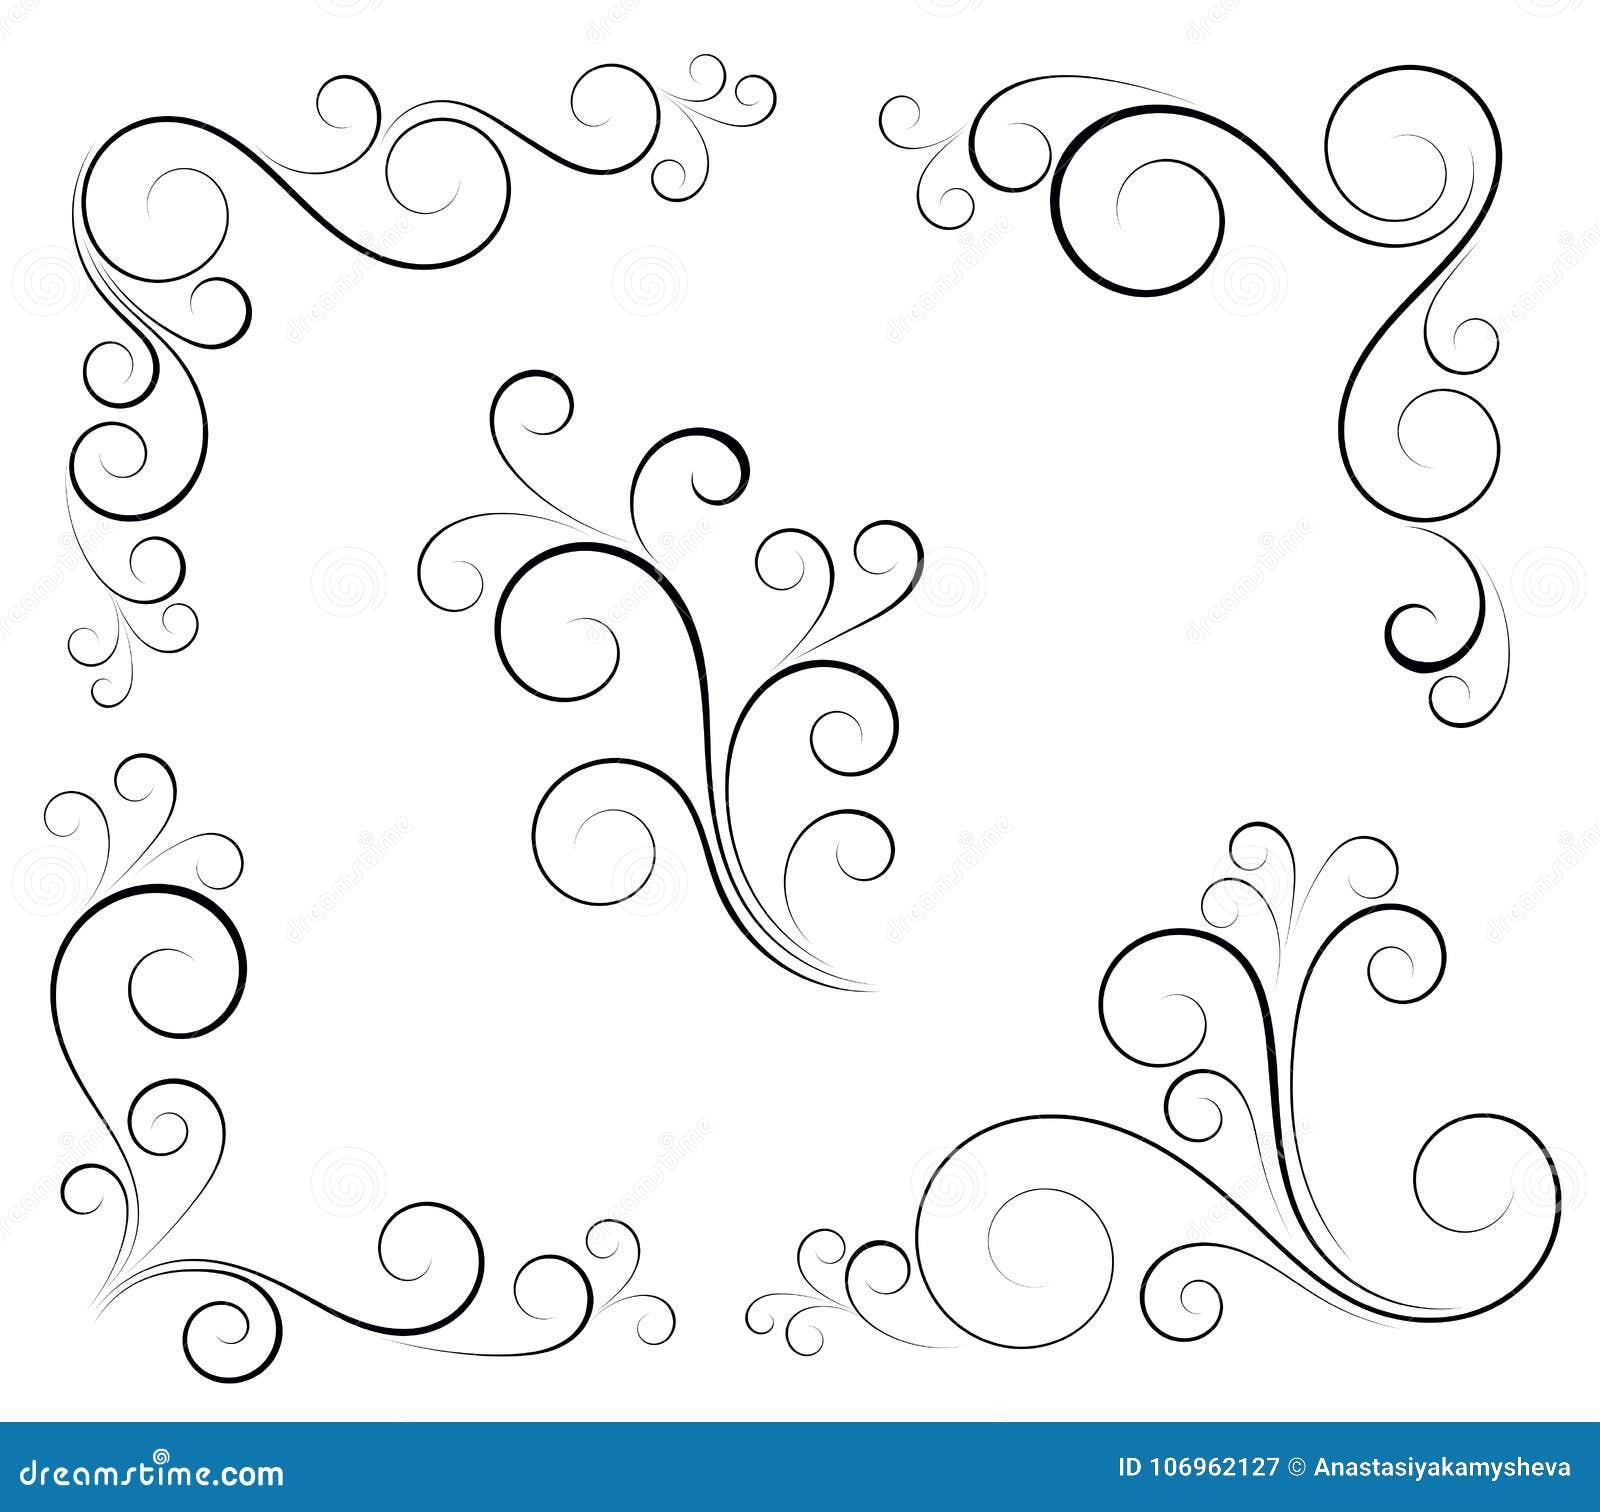 Black And White Vectore Curl Florish Vignette Stock Vector Illustration Of Vectore Style 106962127